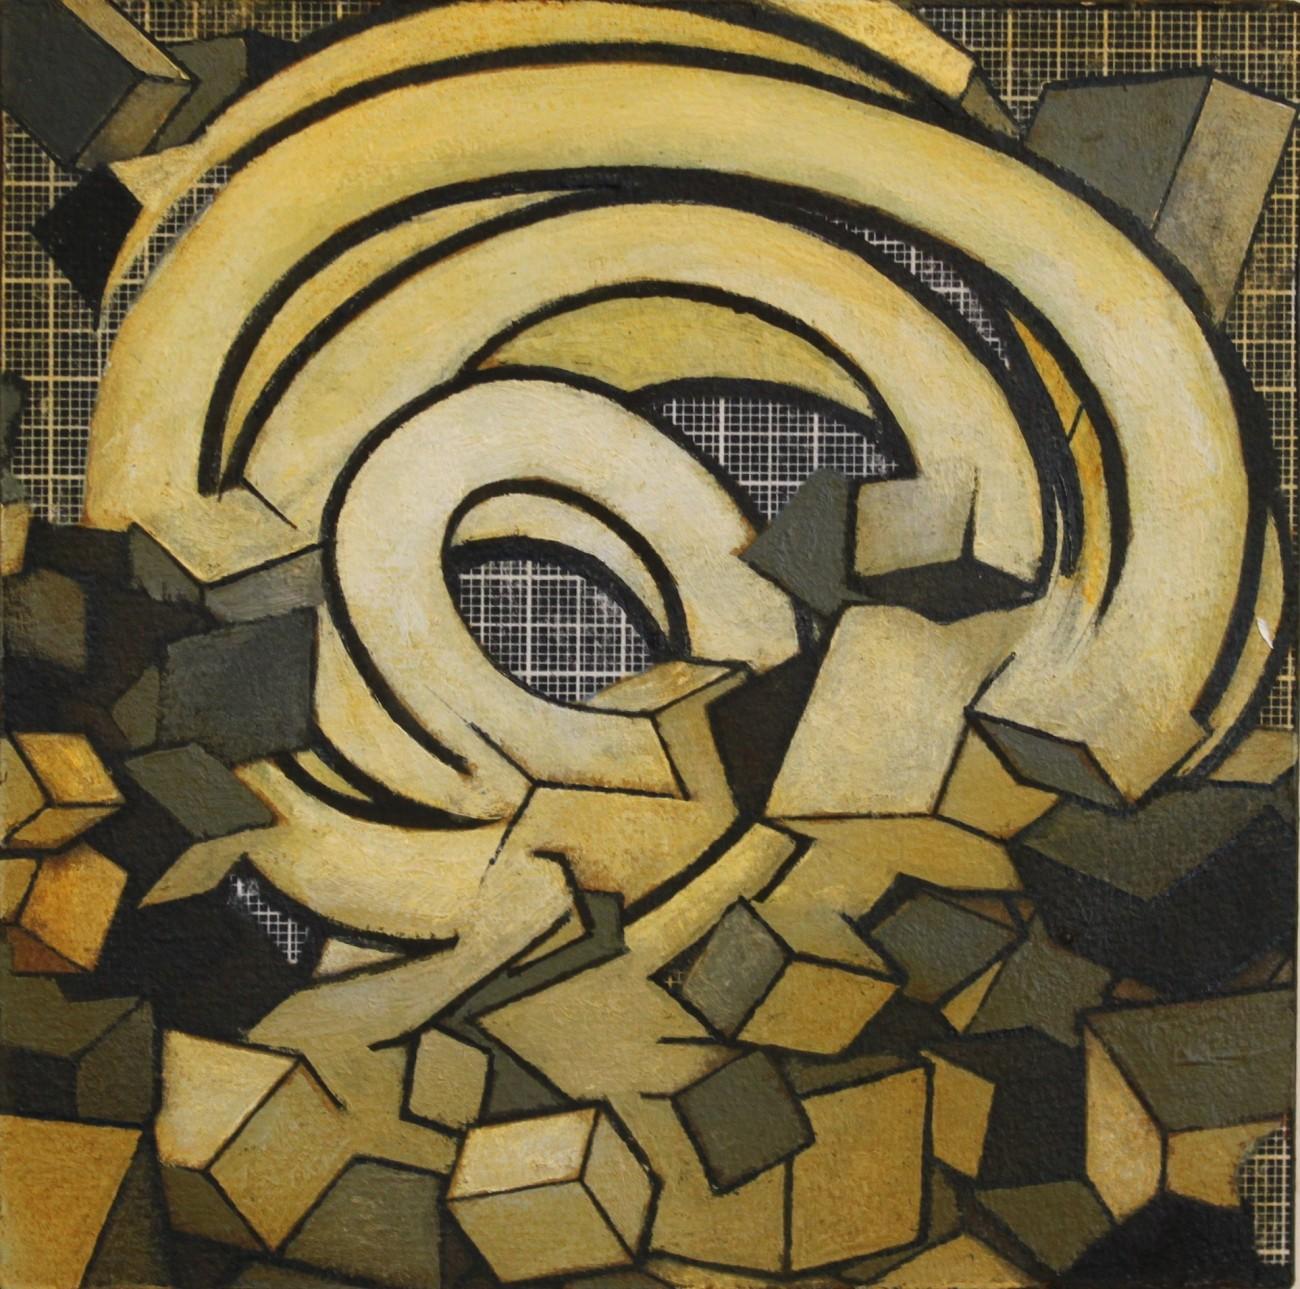 Wolfgang Leidhold, Untitled (Topology No 01) - Acrylic, egg-tempera & oil on panel, 5,9 x 5,9 inches, 2014 Acryl, Tempera & Öl auf Leinwand, 15 x 15 cm, 2014